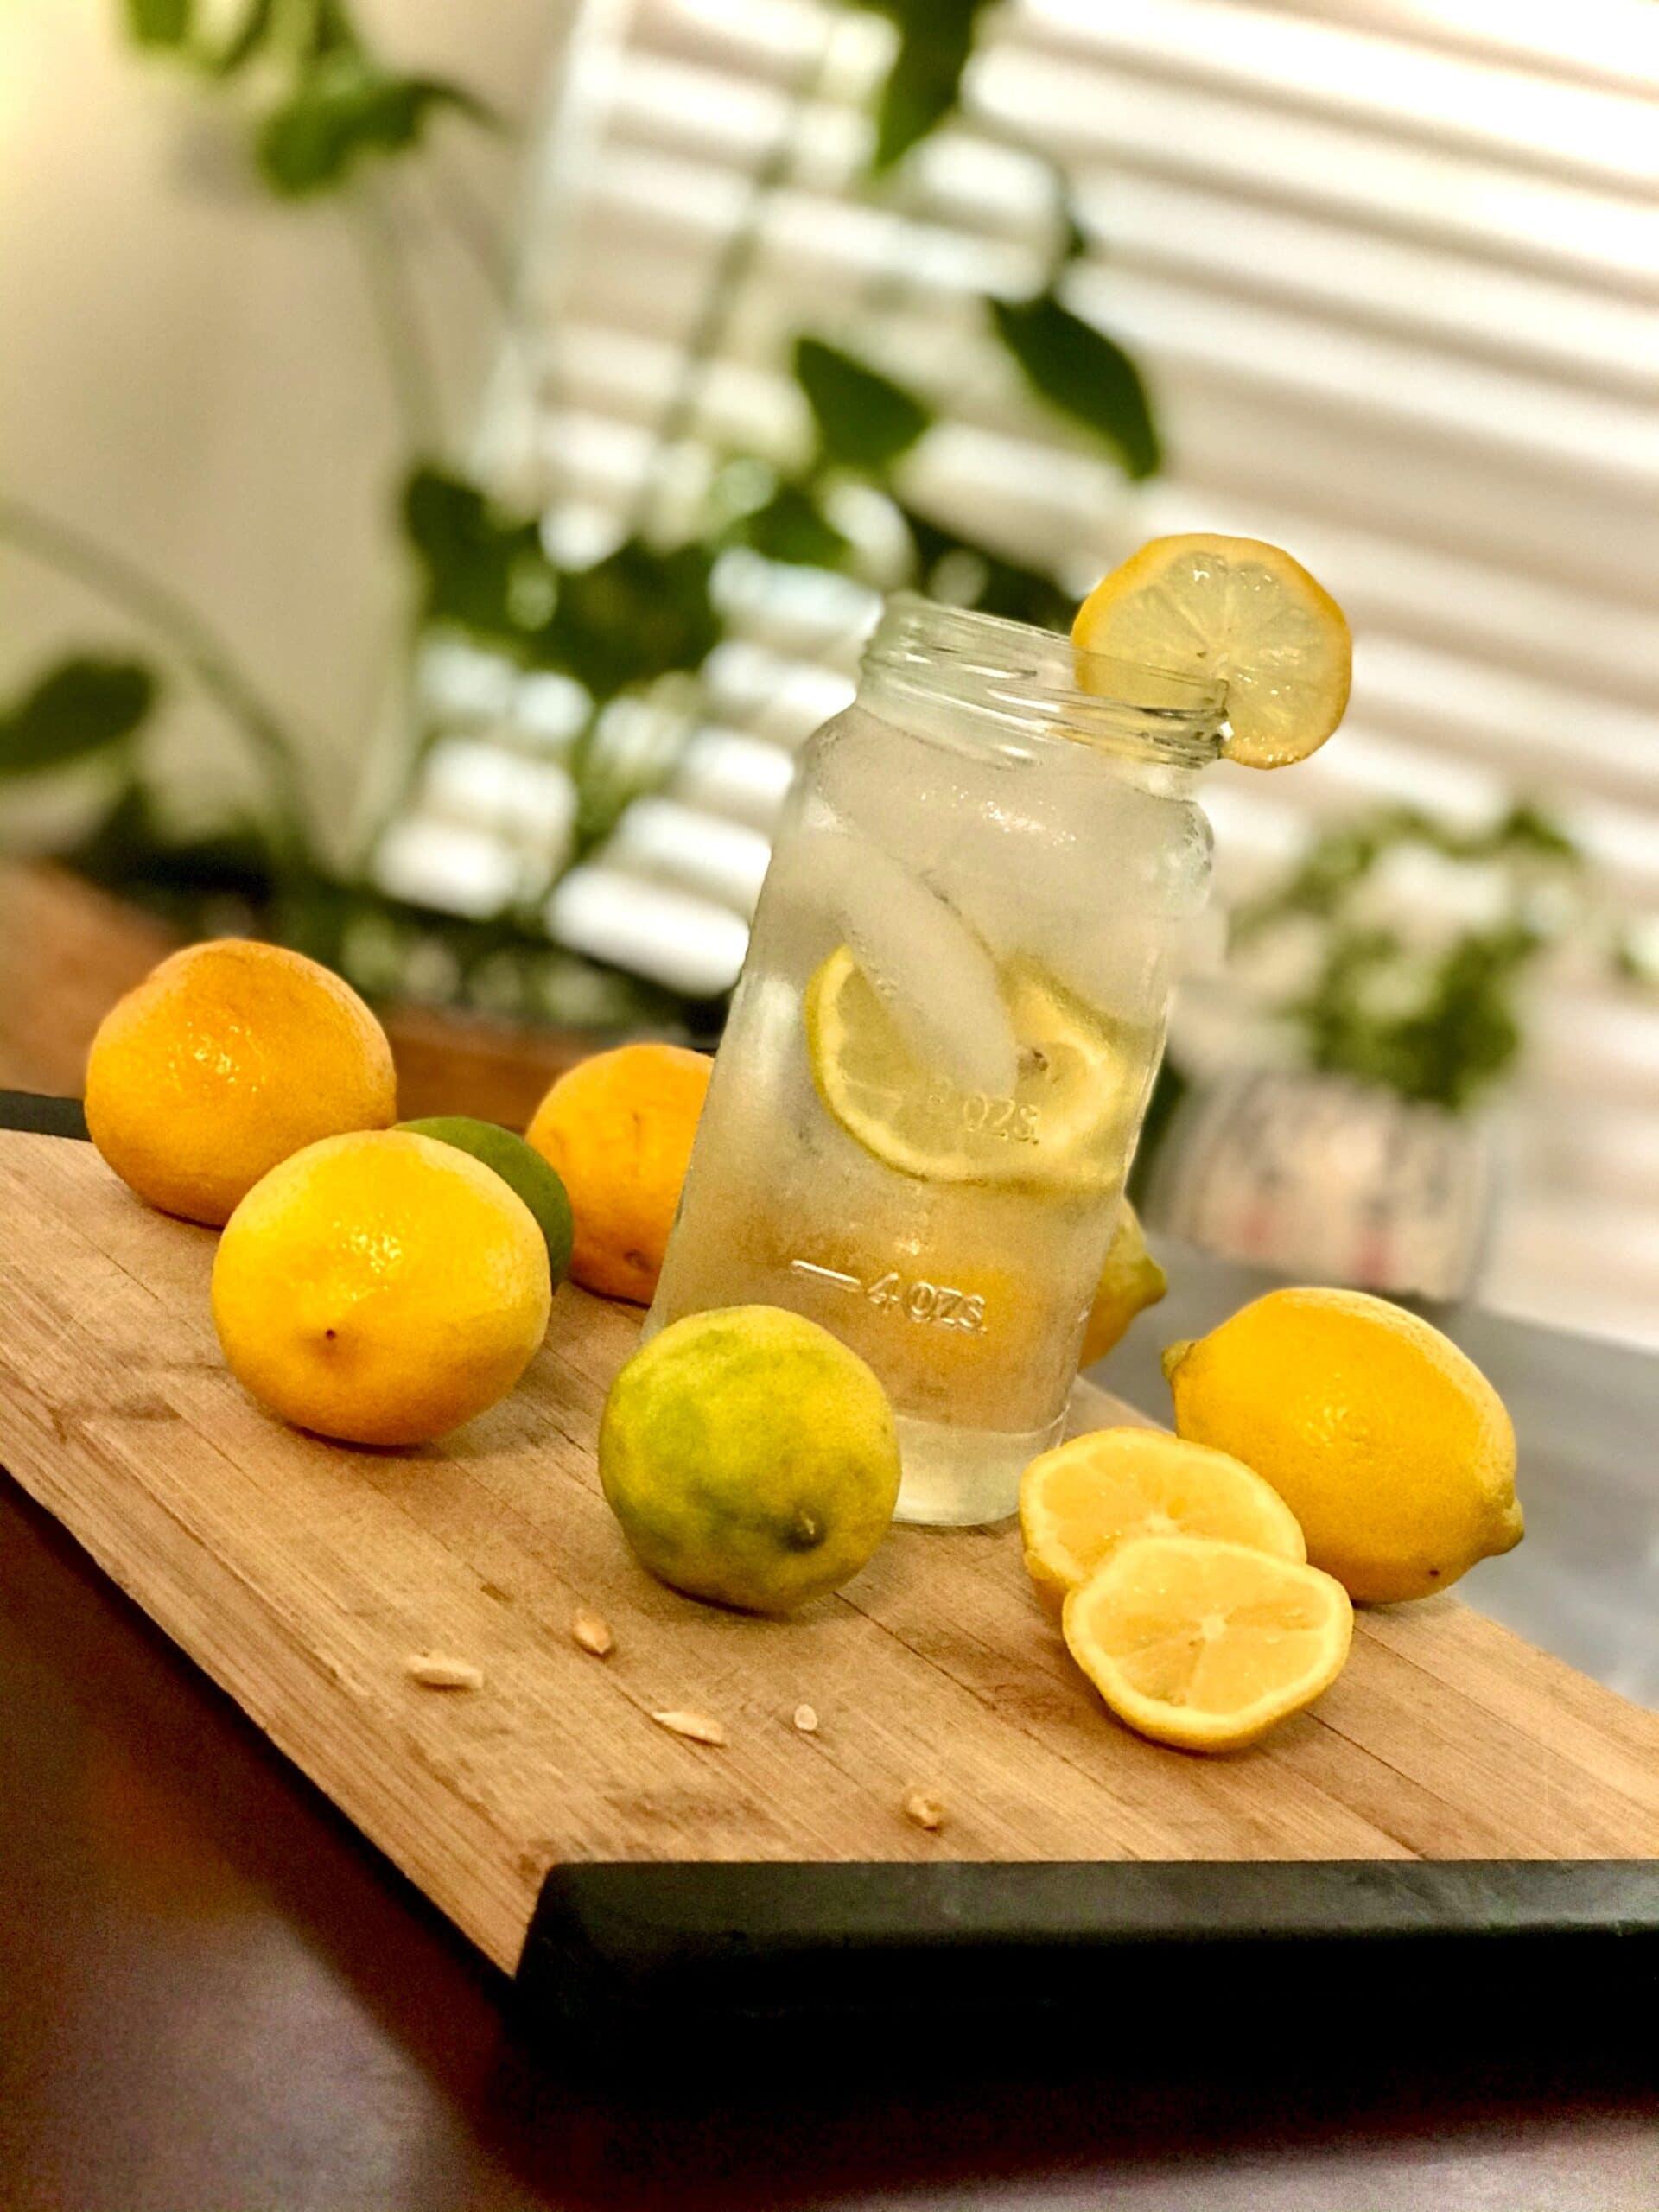 lemons and glass of water